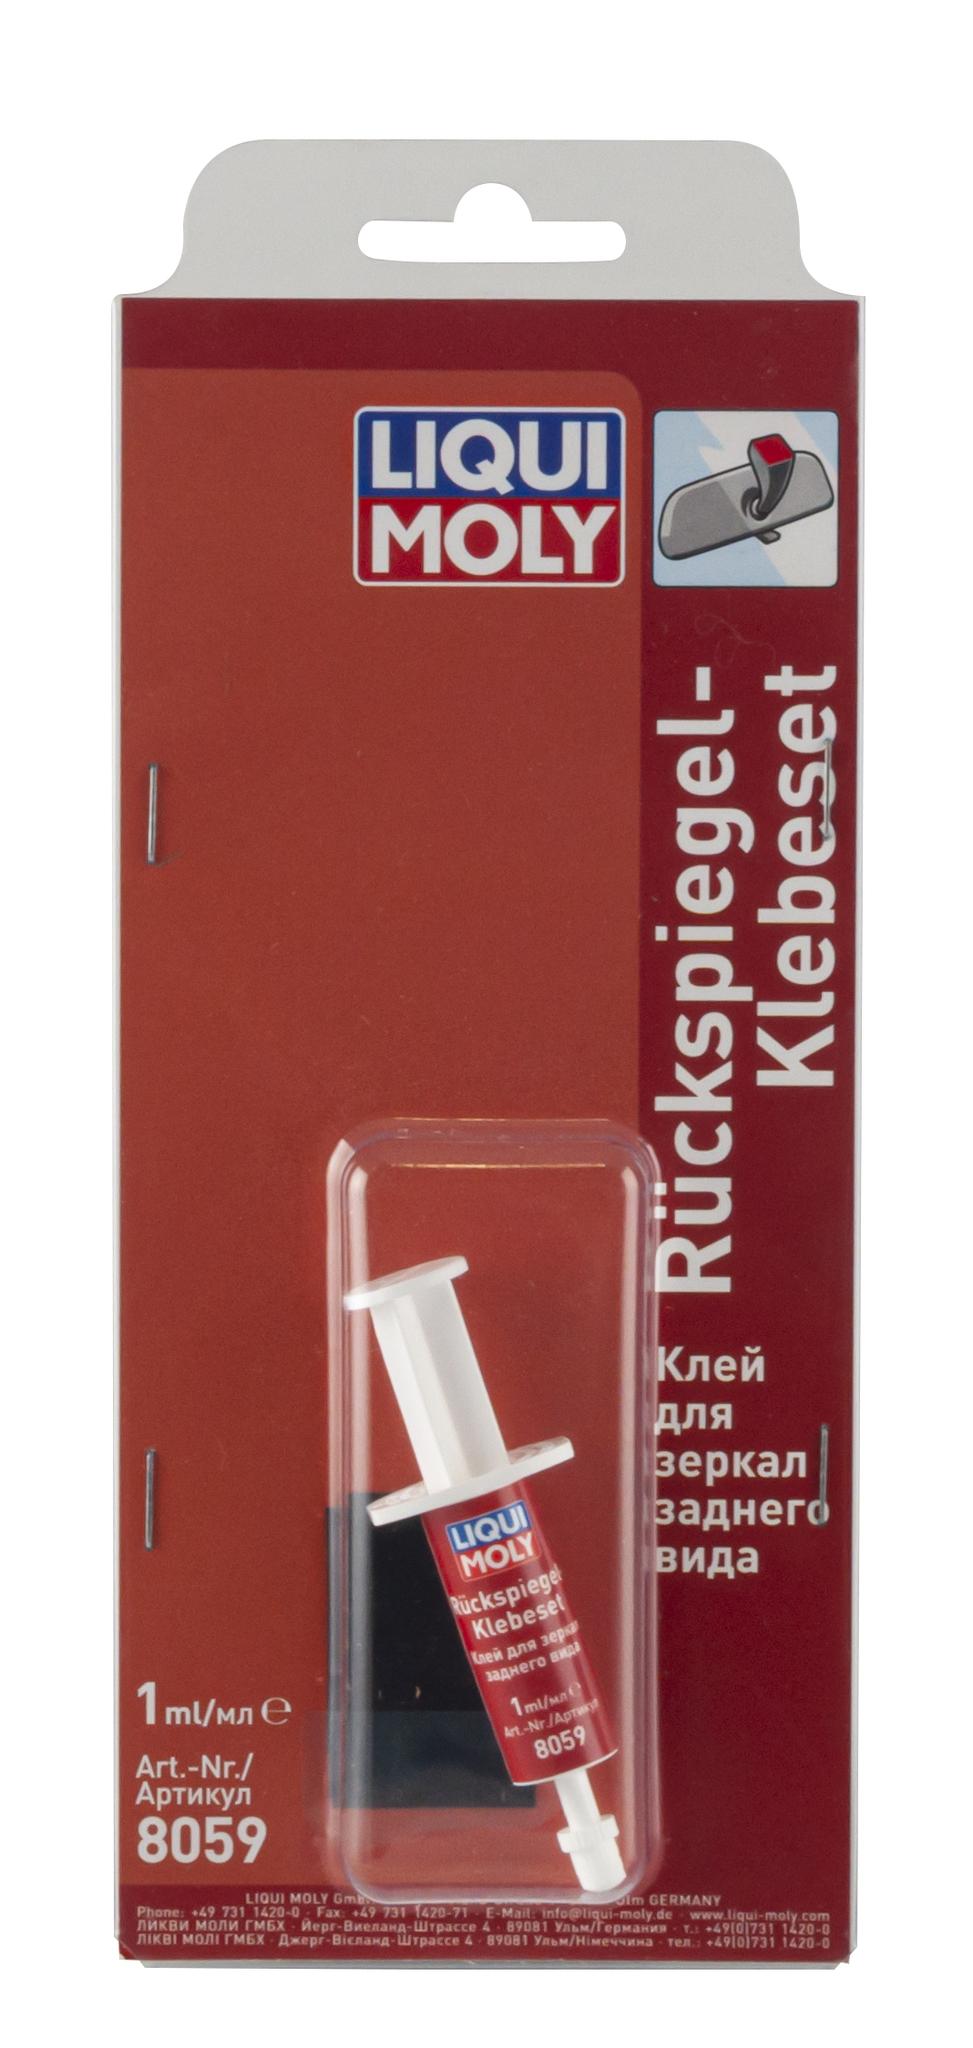 Liqui Moly Ruckspiegel Klebe Set Клей для зеркал заднего вида